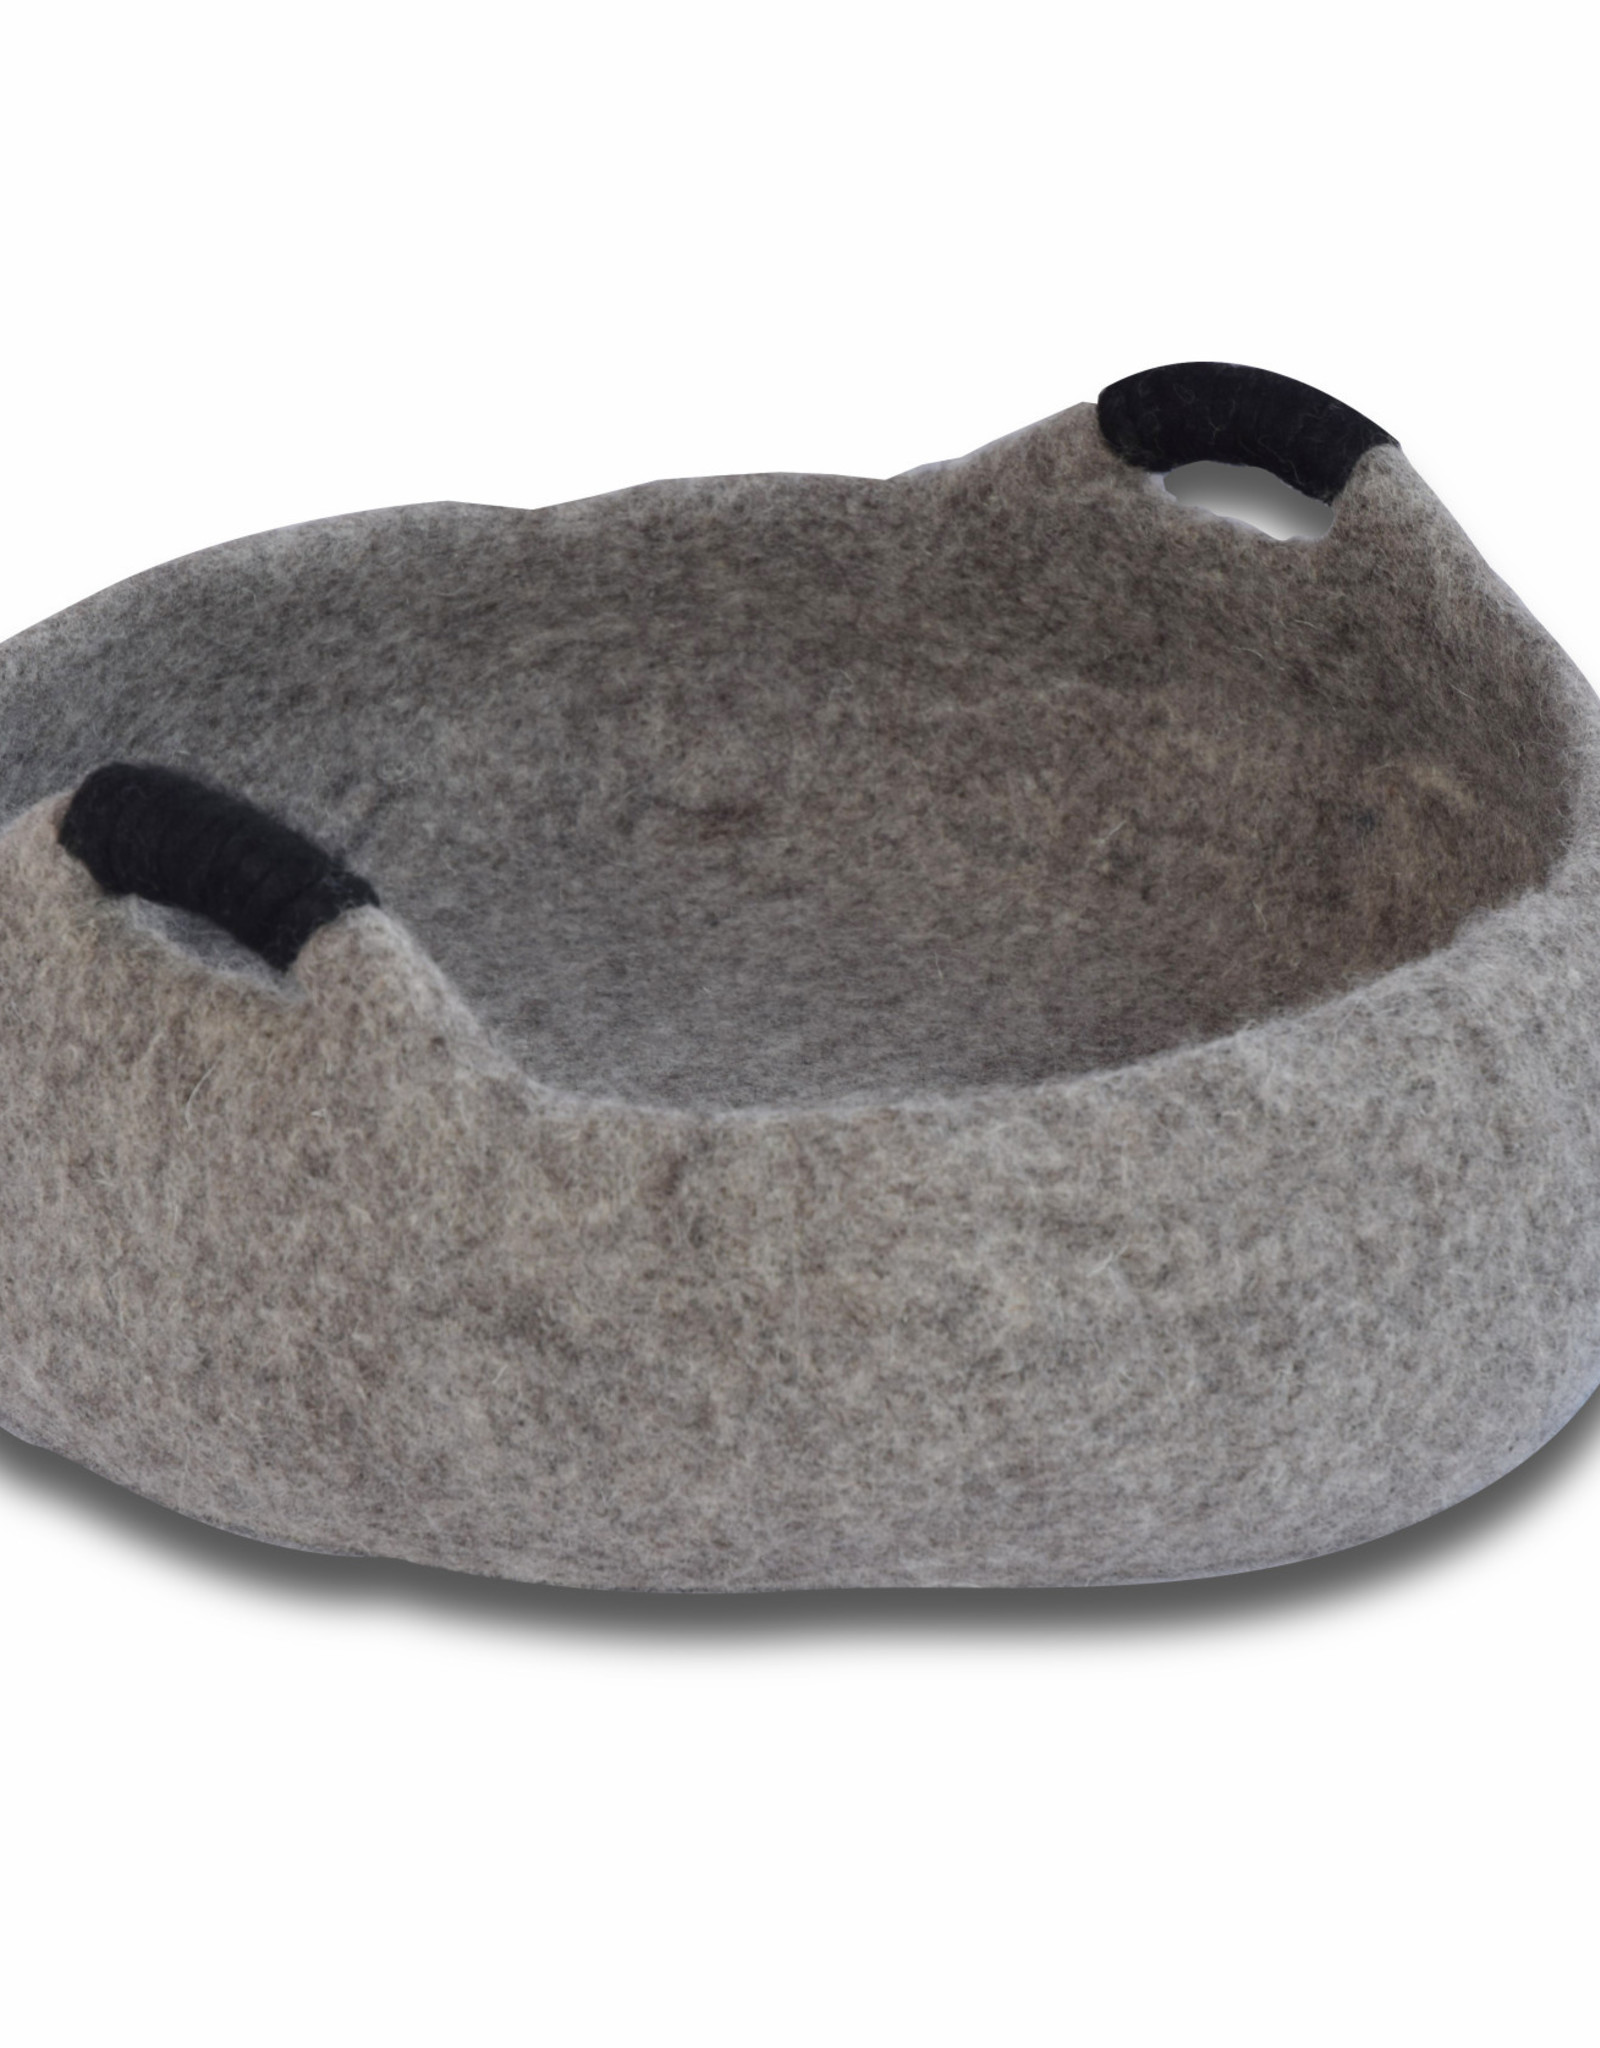 Dharma Dog Karma Cat Handle Pet Basket